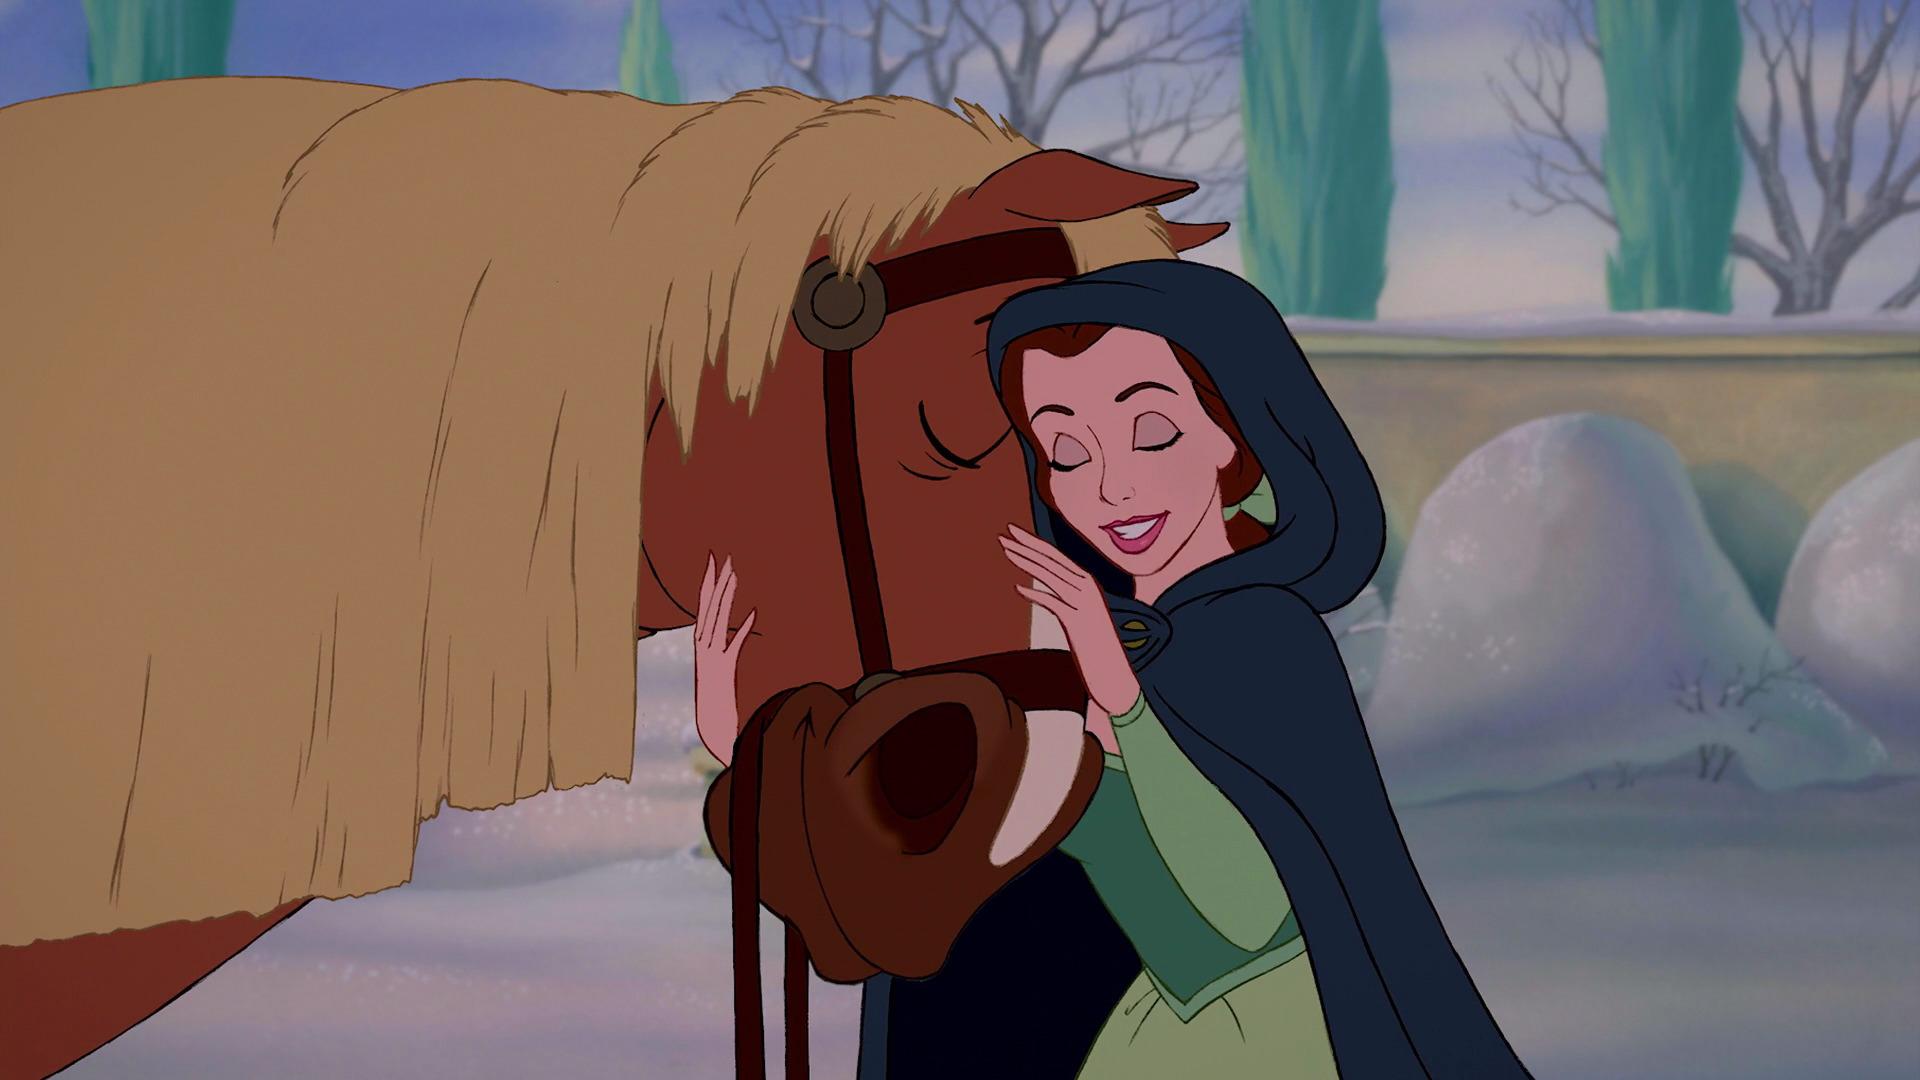 Beauty And The Beast Disneyscreencaps 5916